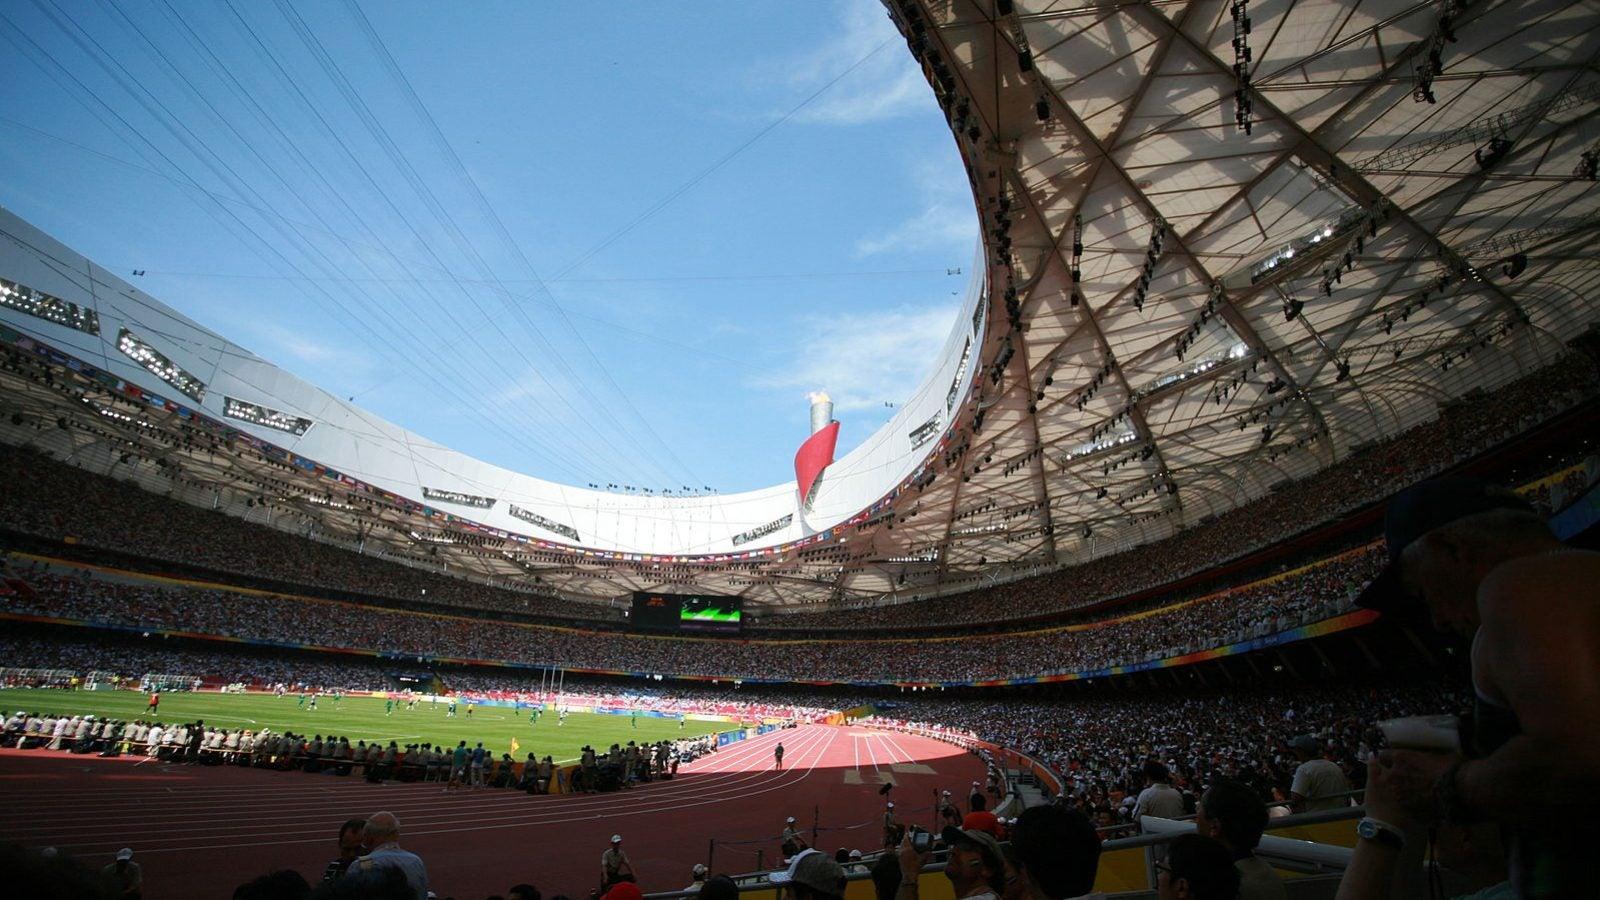 2008 Beijing Olympics Bird's Nest